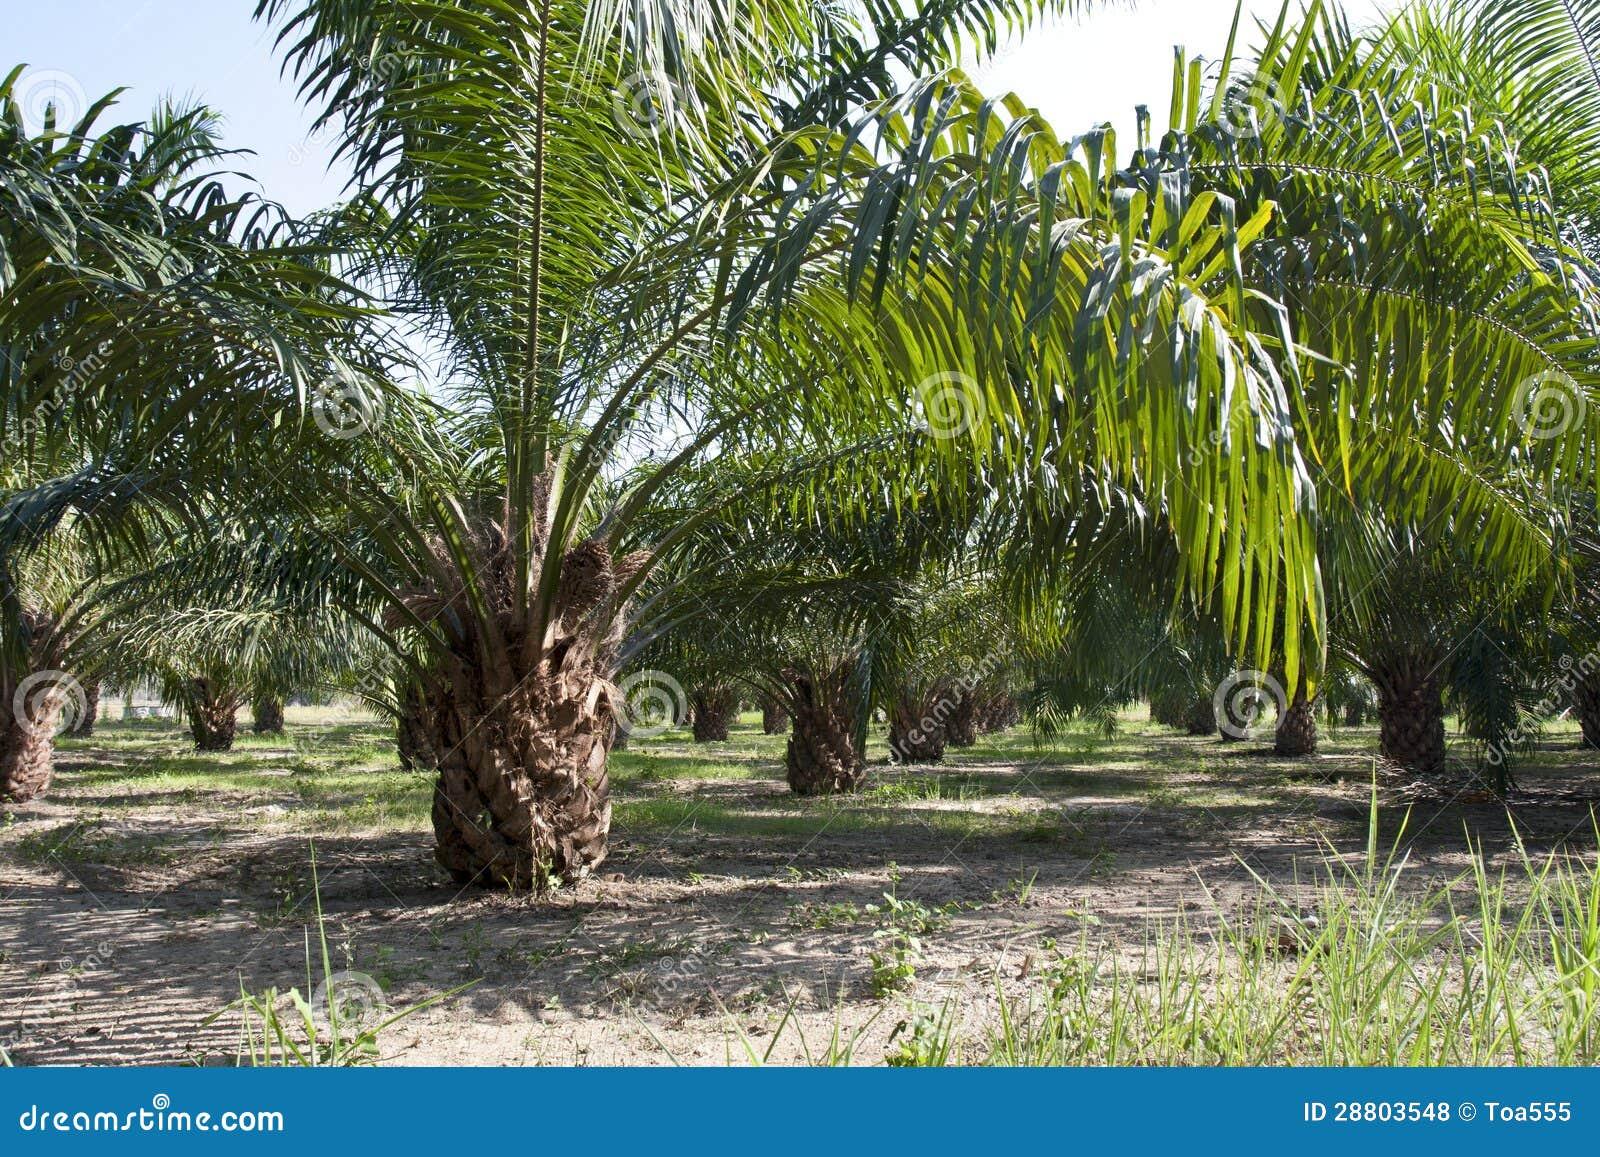 palm oil plantation business plan